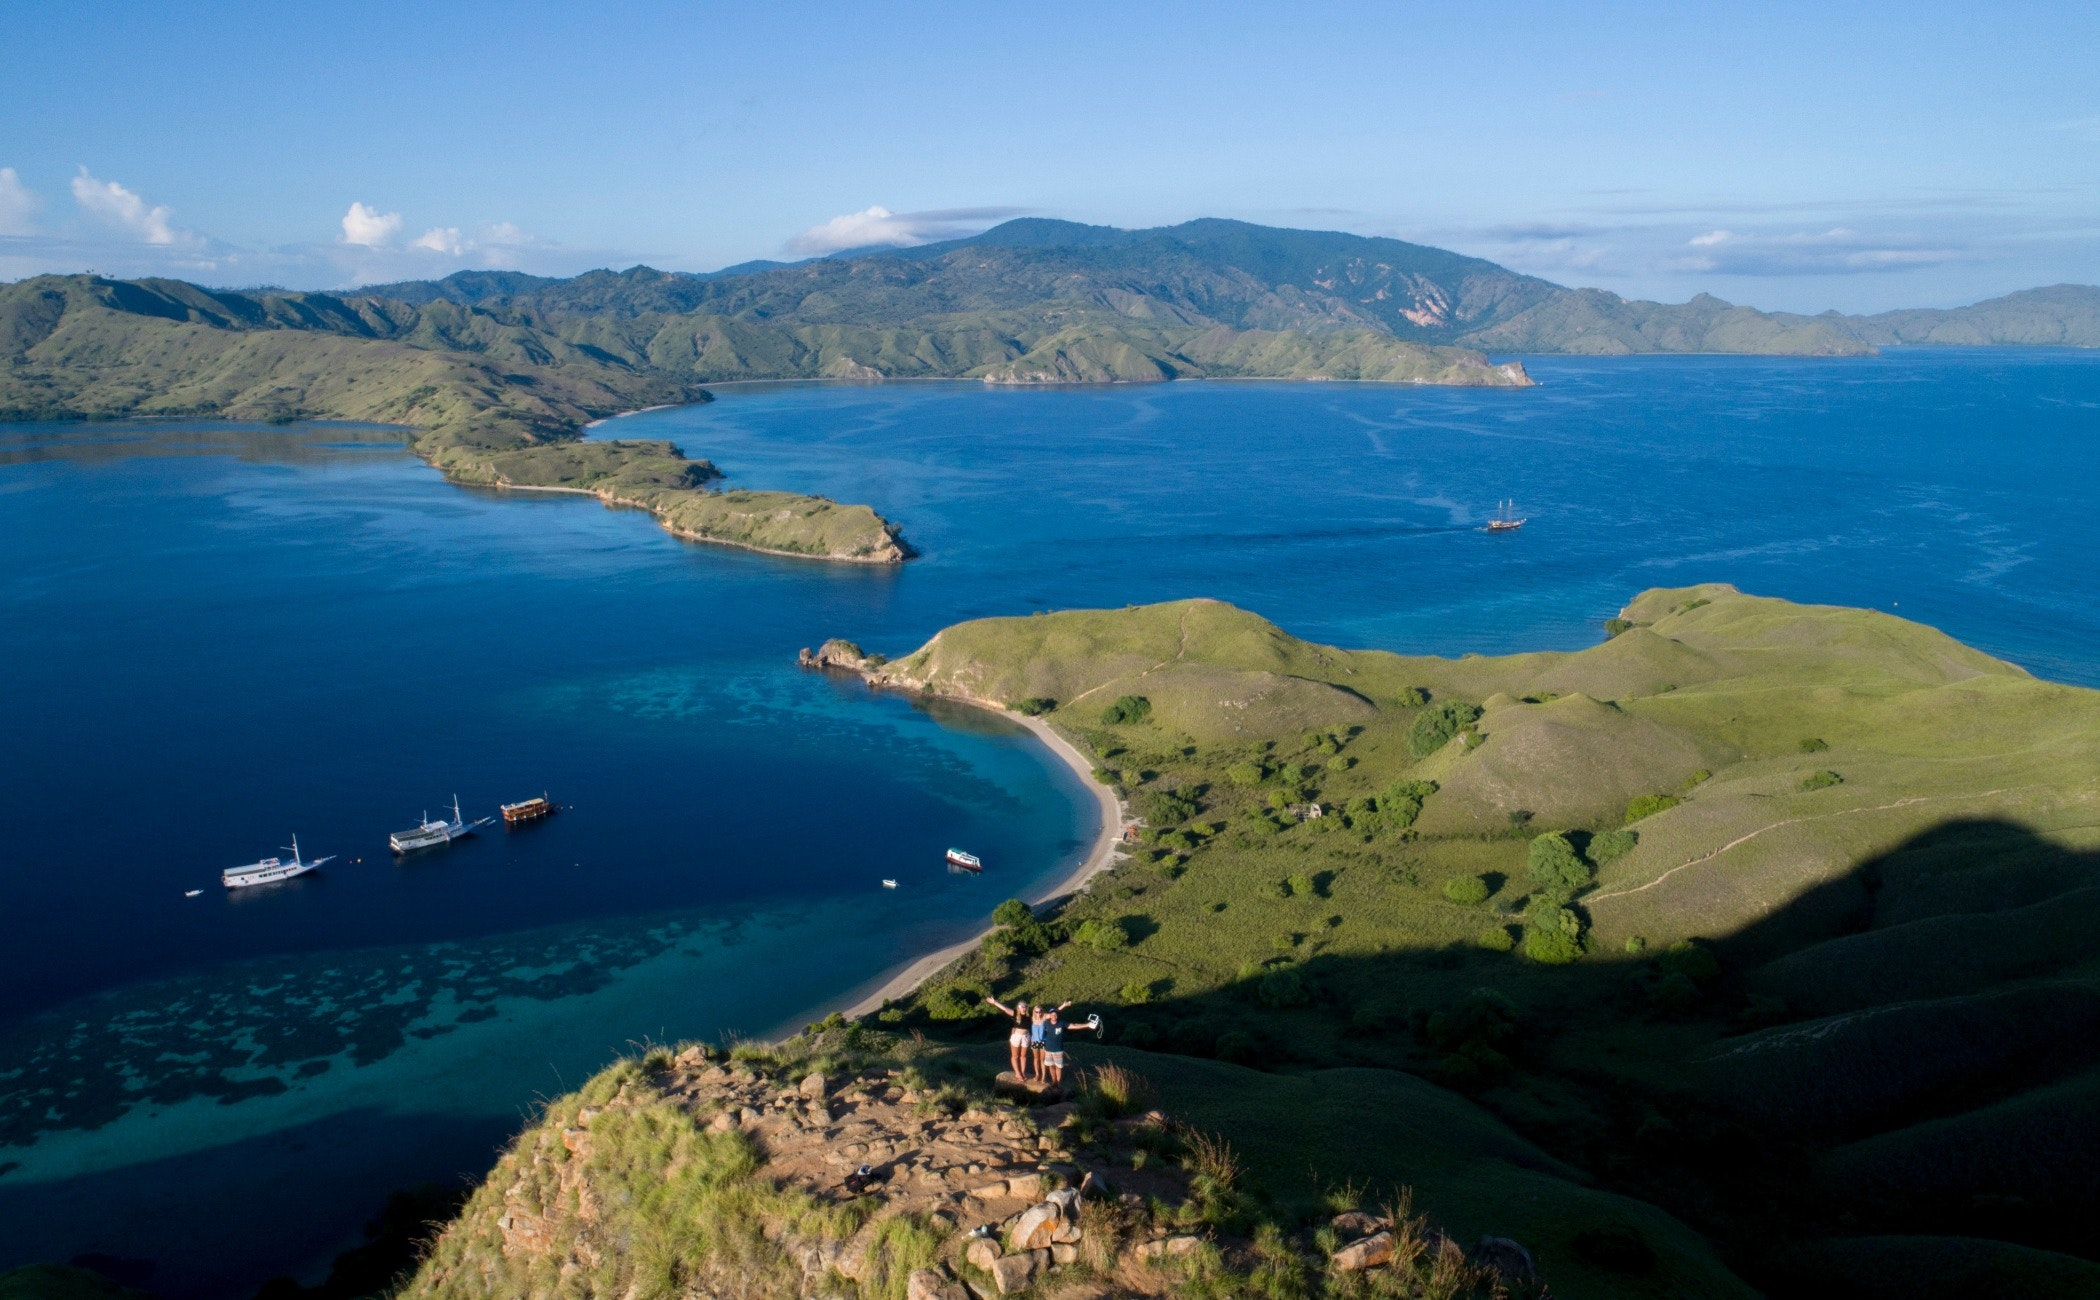 land,outdoors,nature,water,sea,shoreline,coast,boat,transportation,peninsula